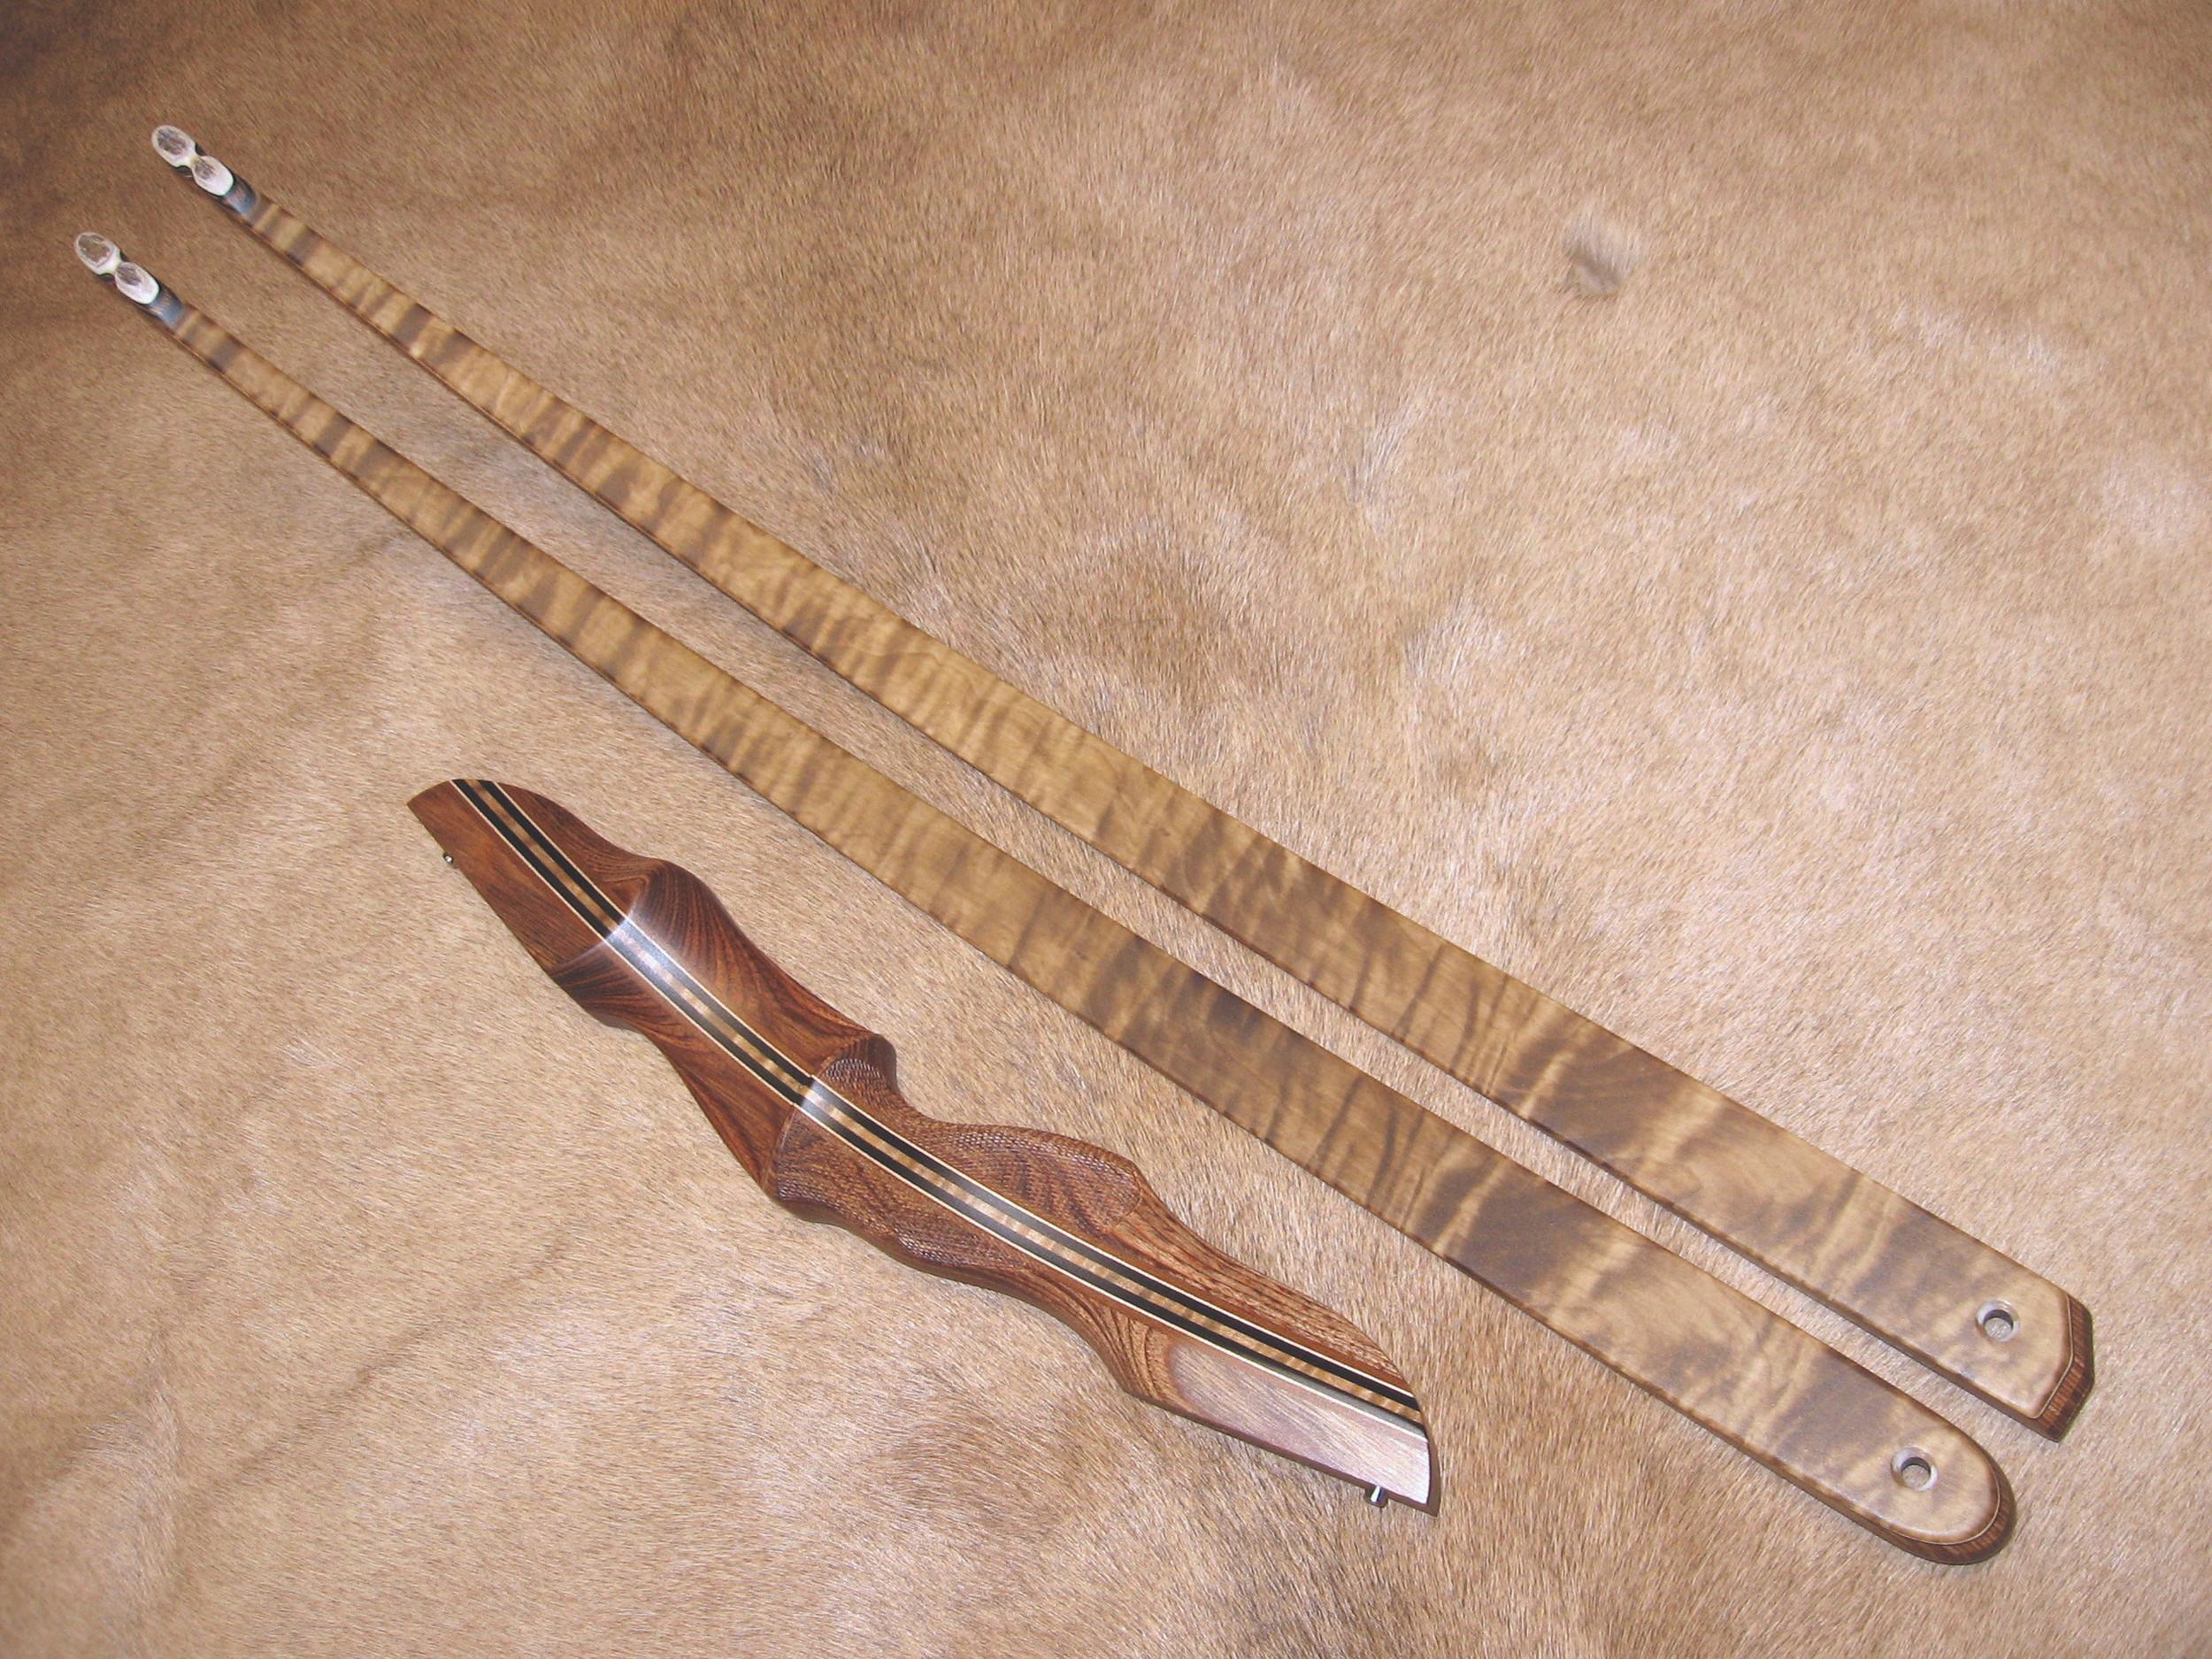 Walnut Dym Riser- Quilted Maple LImbs